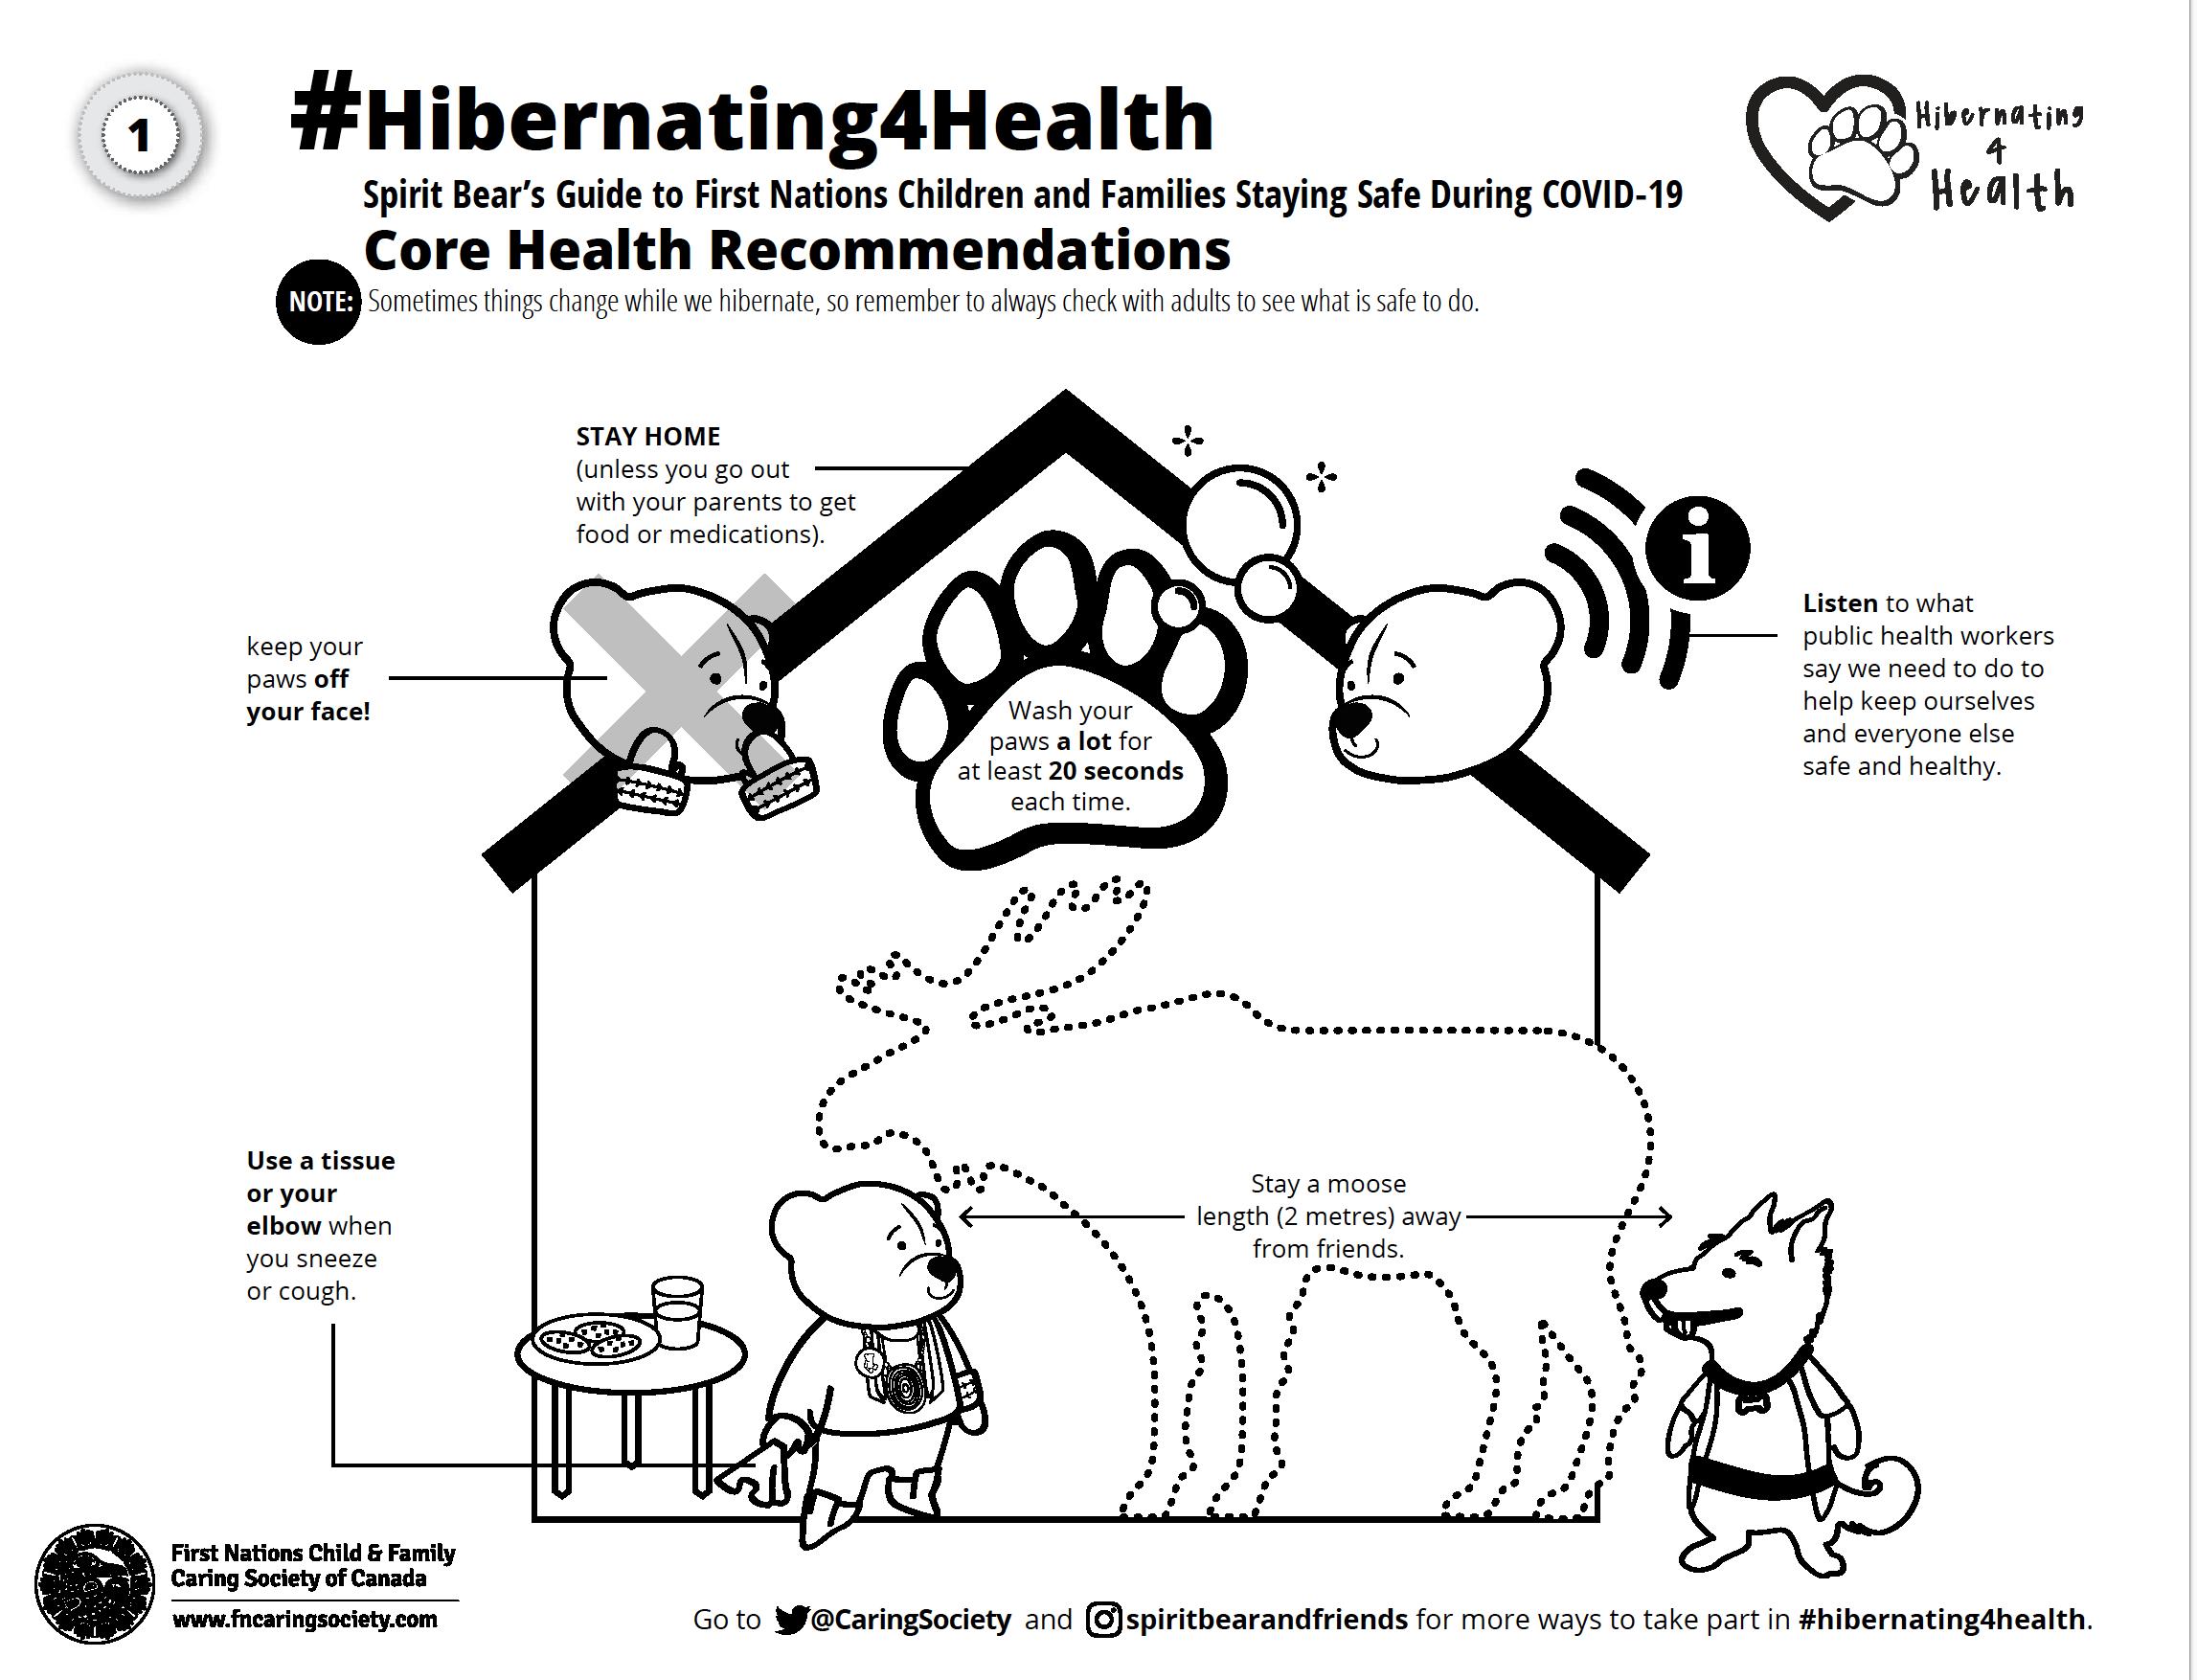 #Hibernating4Health Colouring Sheet #1